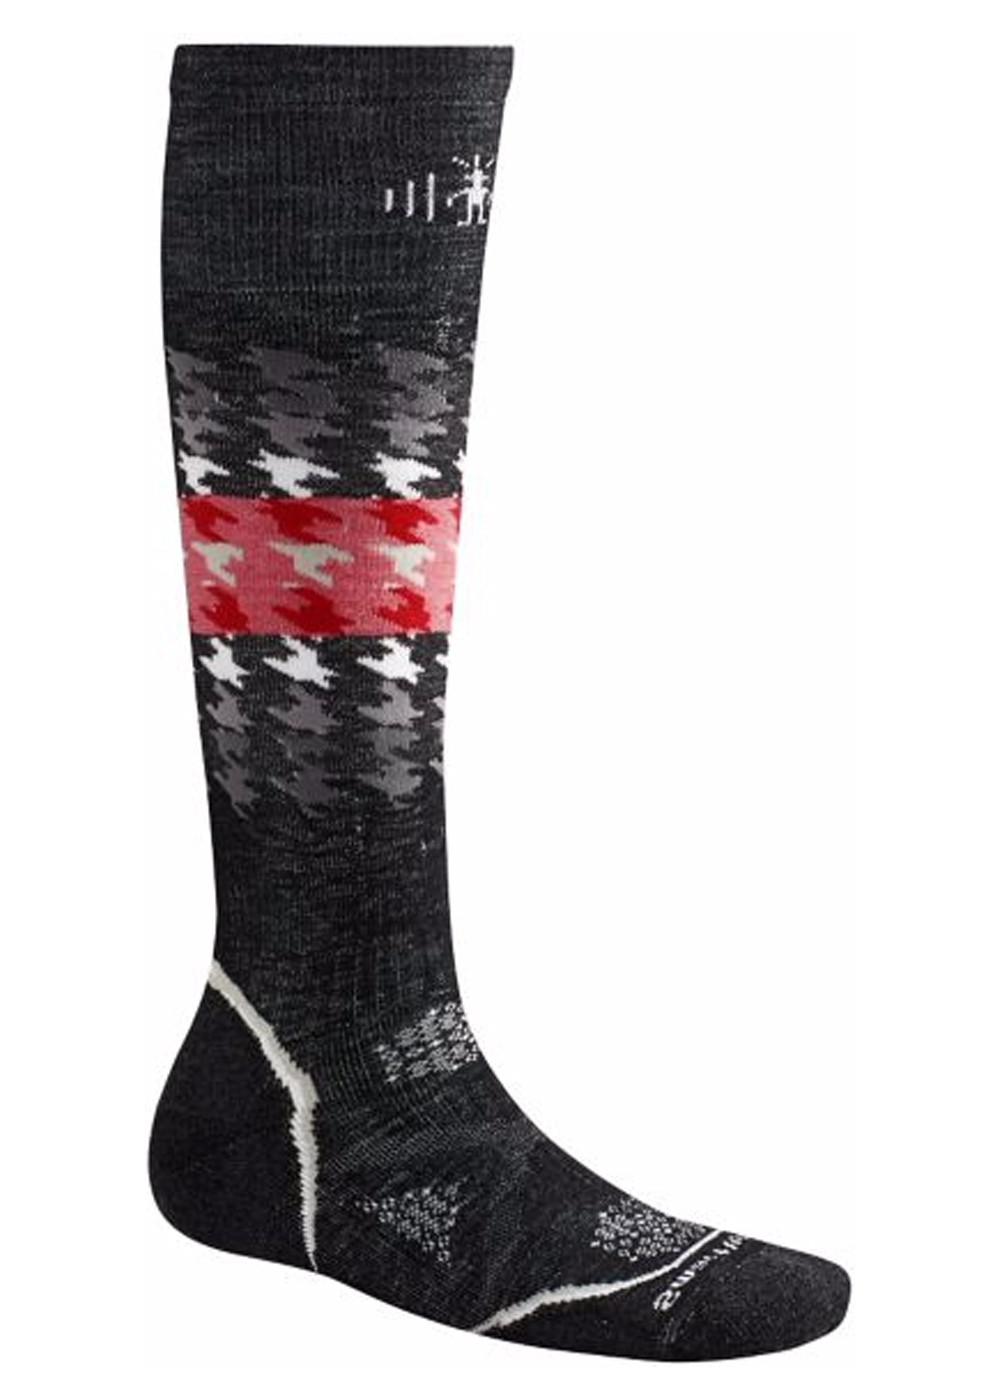 Smartwool PhD Snowboard Socks